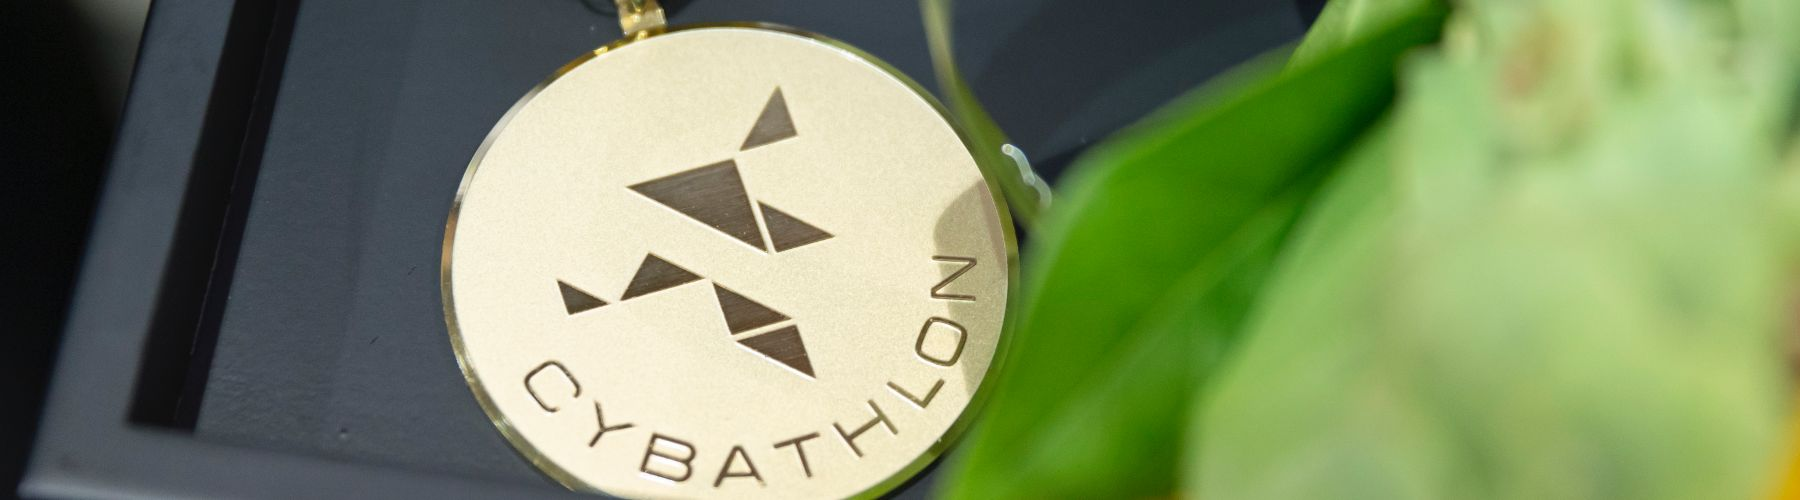 ETH Zürich – Cybathlon 2016 cover image